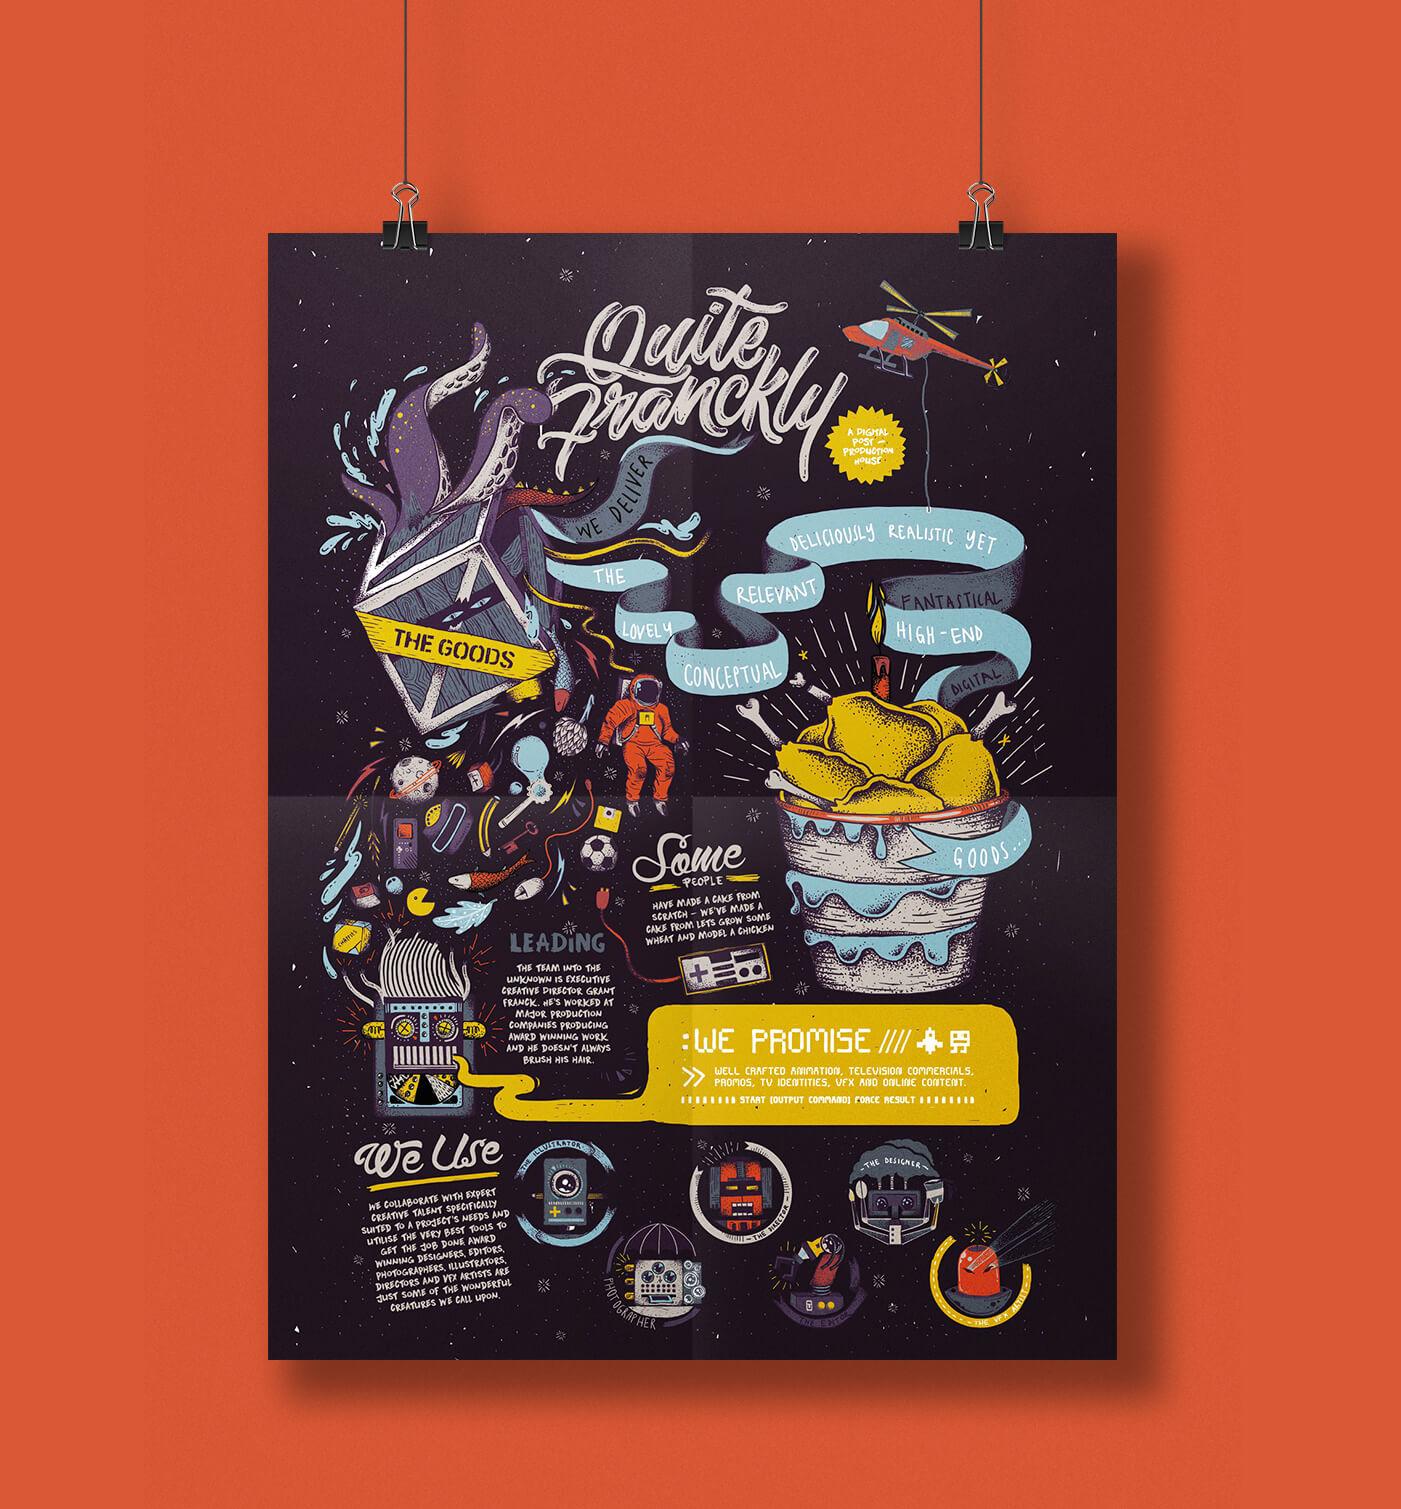 aurora creative studio graphic design illustration cape town portfolio poster